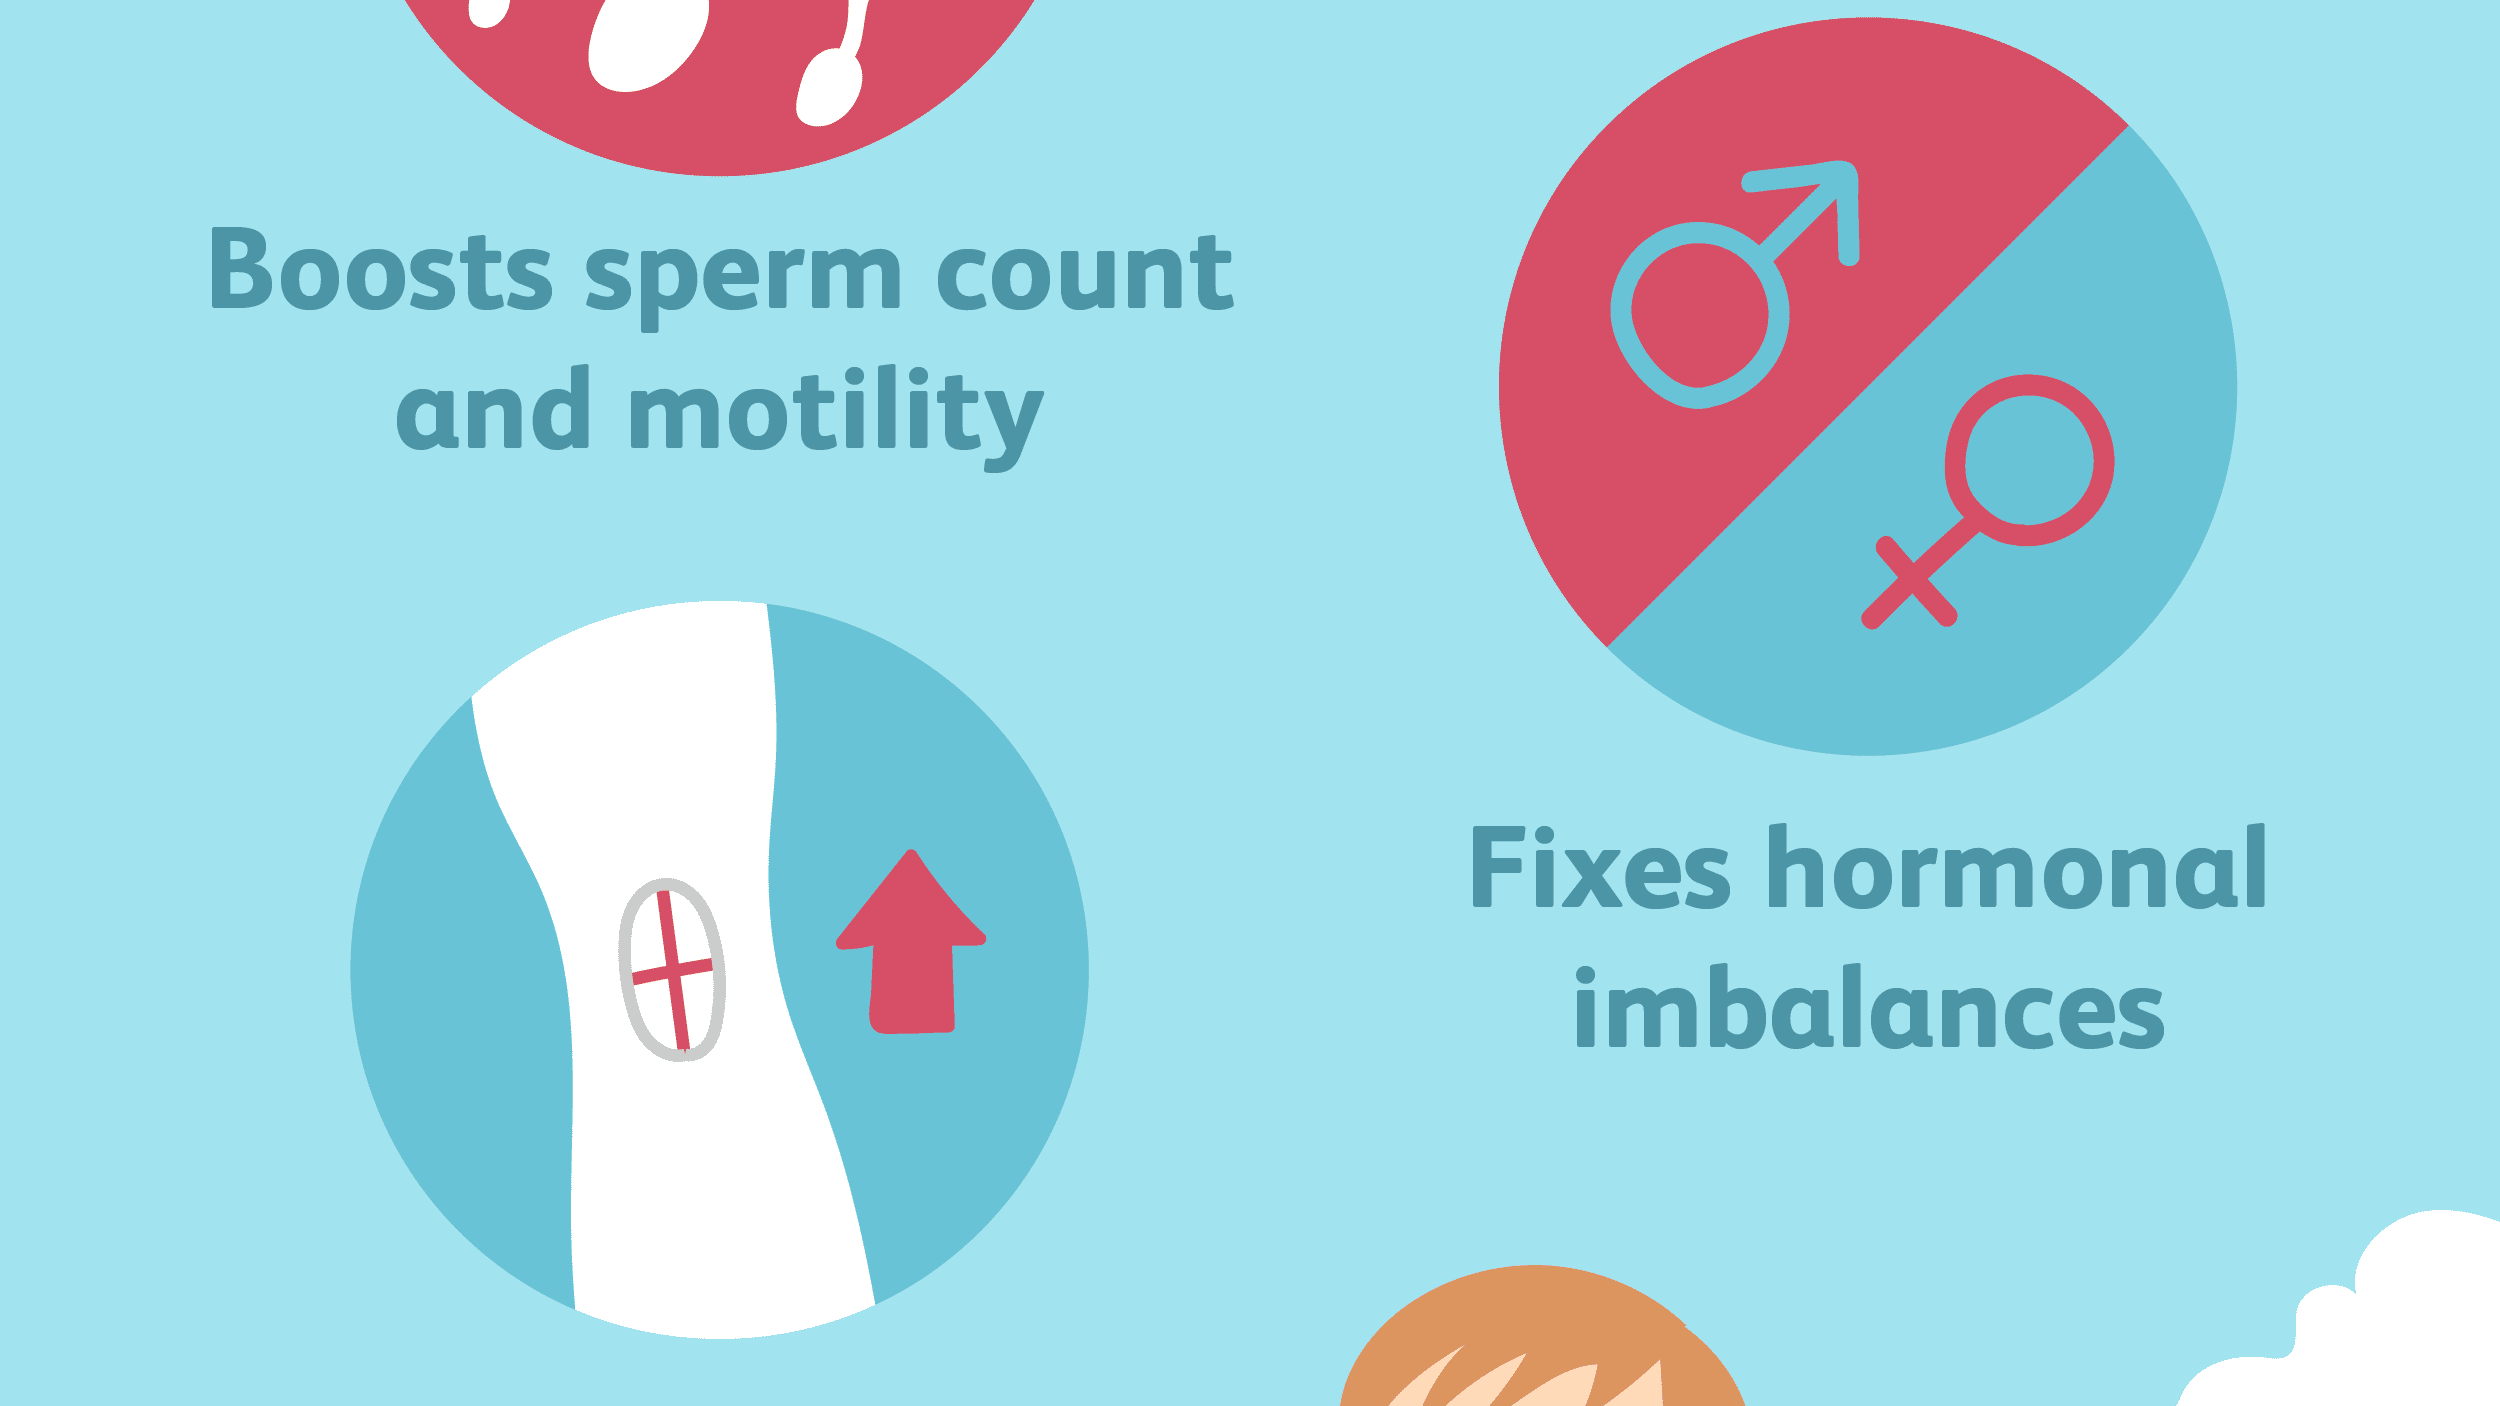 prueba de próstata affinialidad